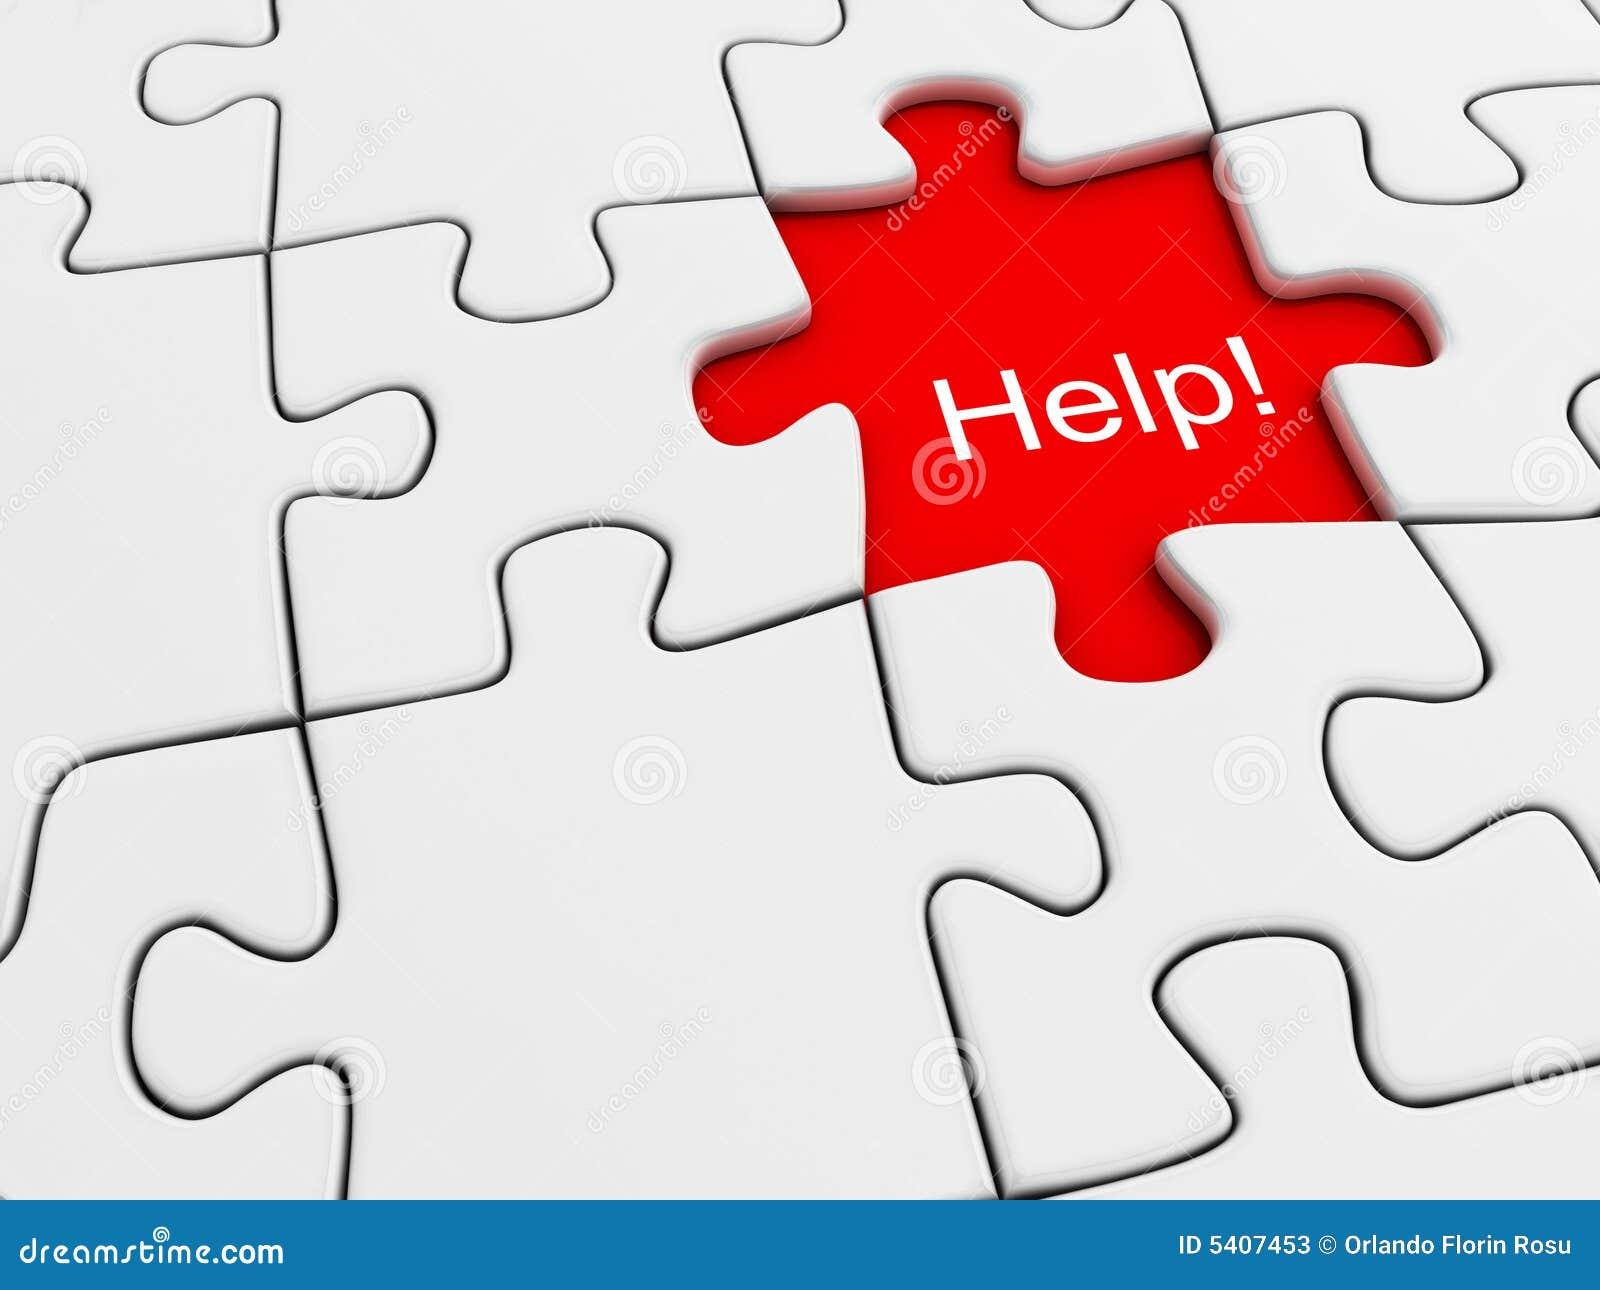 Help Puzzle Stock Photos - Image: 5407453